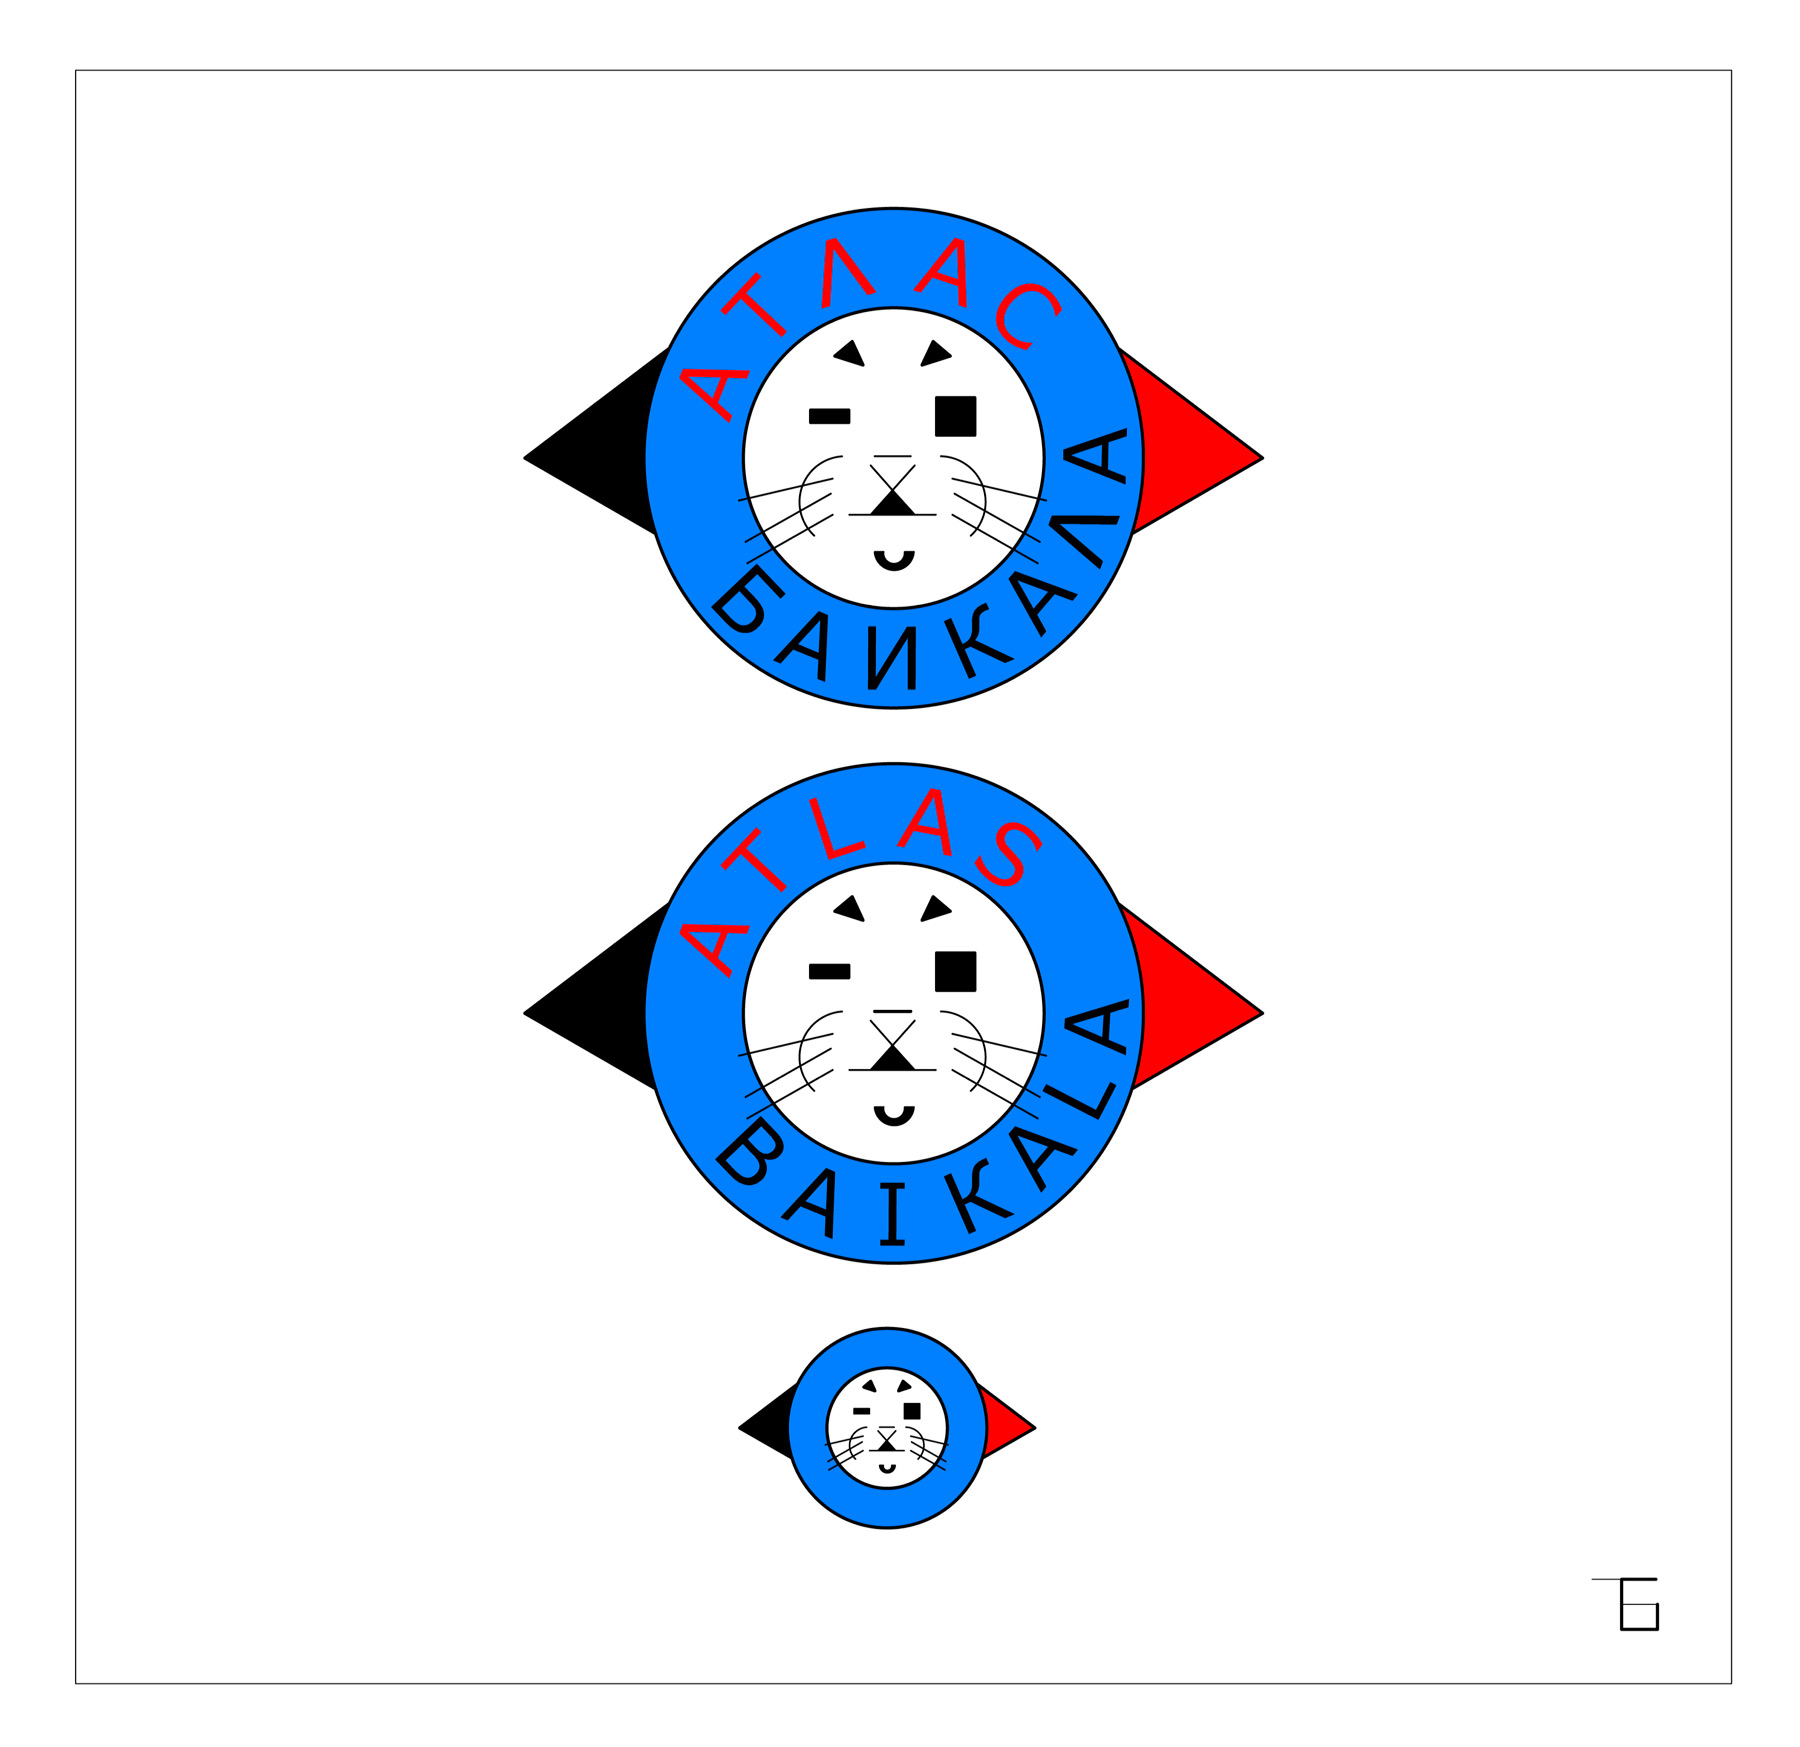 Разработка логотипа Атлас Байкала фото f_0625b050f12c120d.jpg